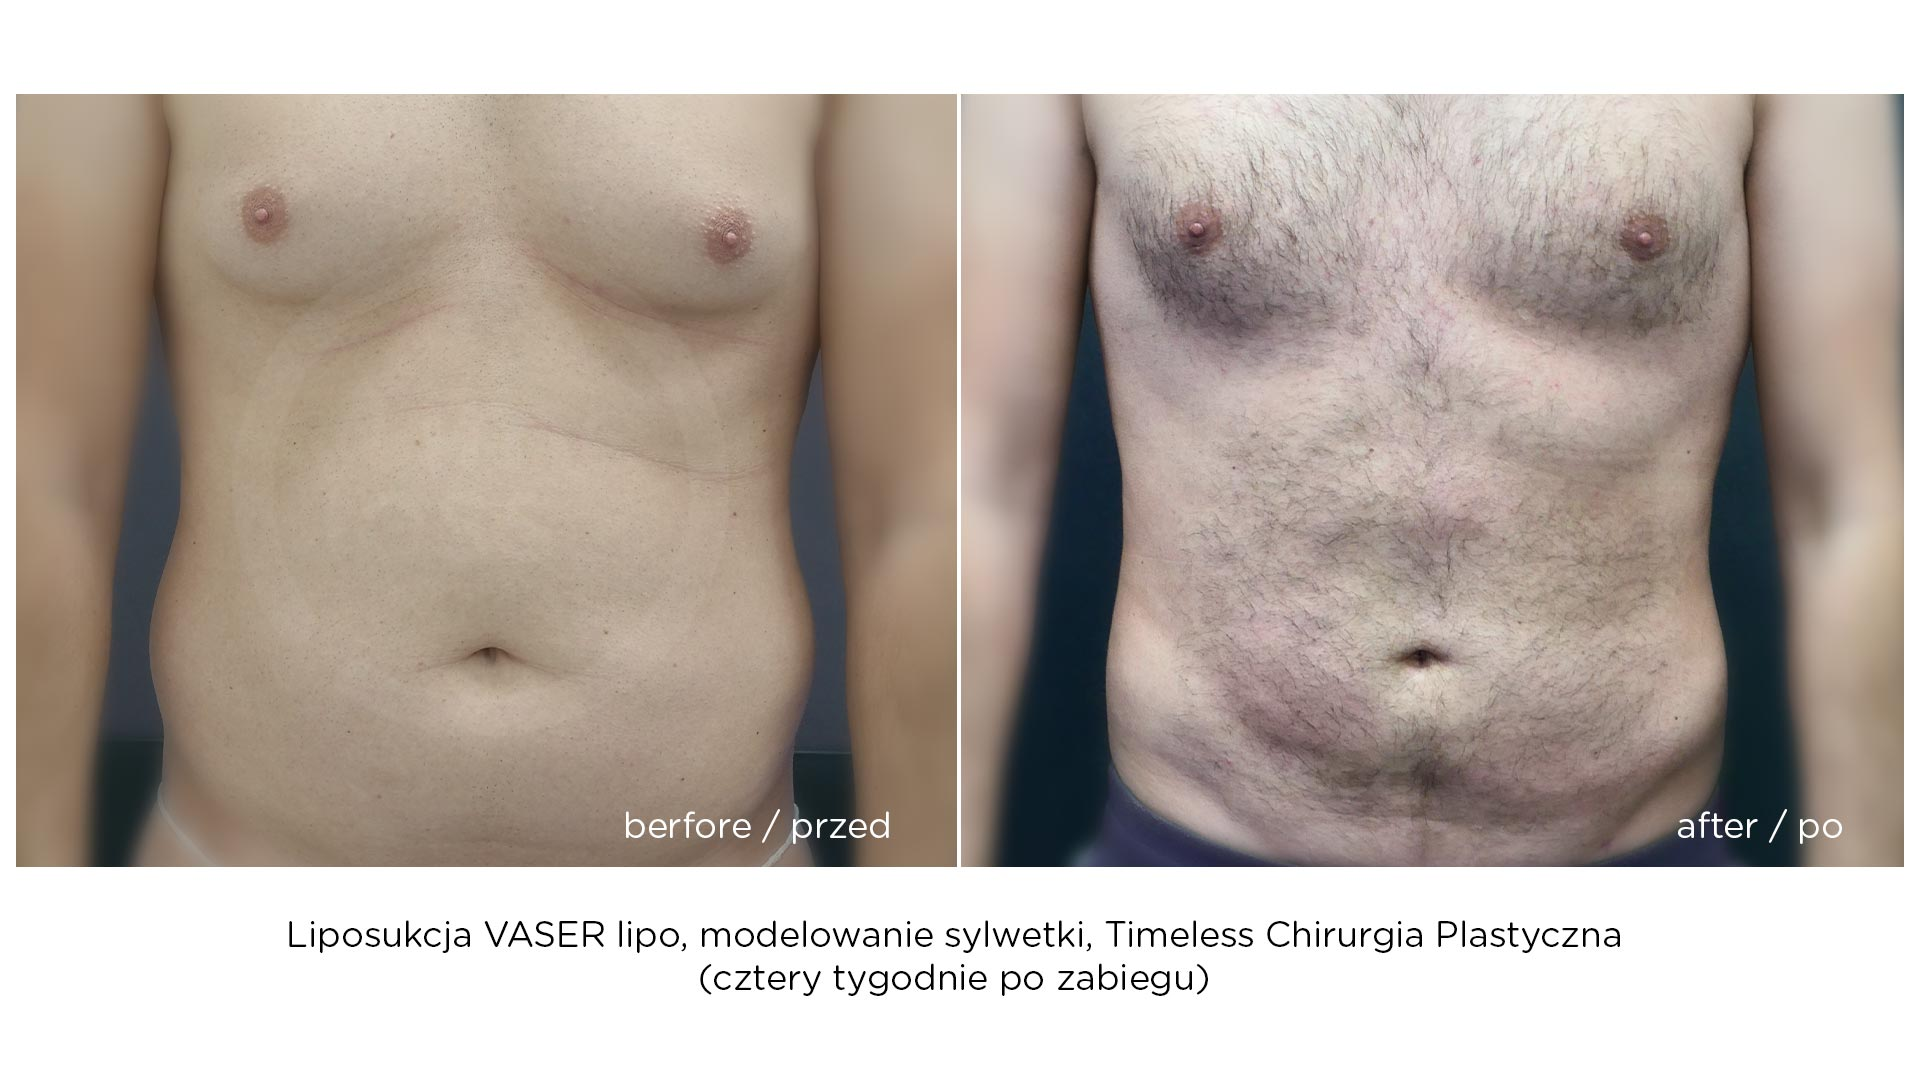 liposukcja-vaser-hd-2020-a1